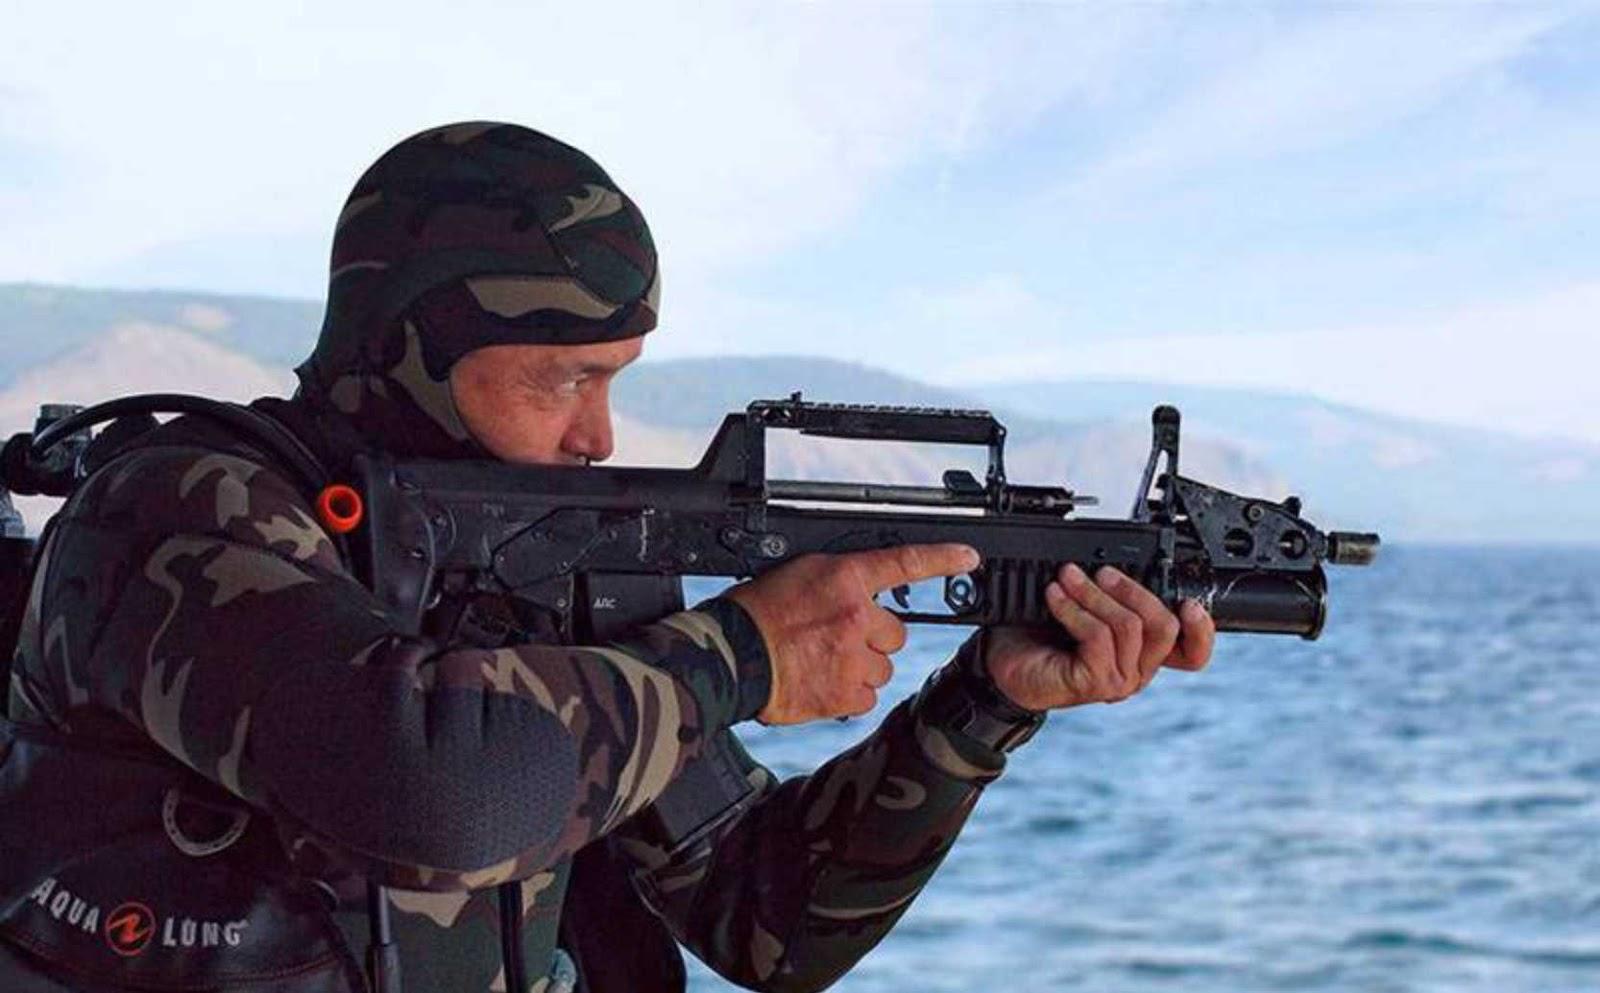 Senapan fungsi ganda bawah air dan darat telah mulai di pesan Rusia